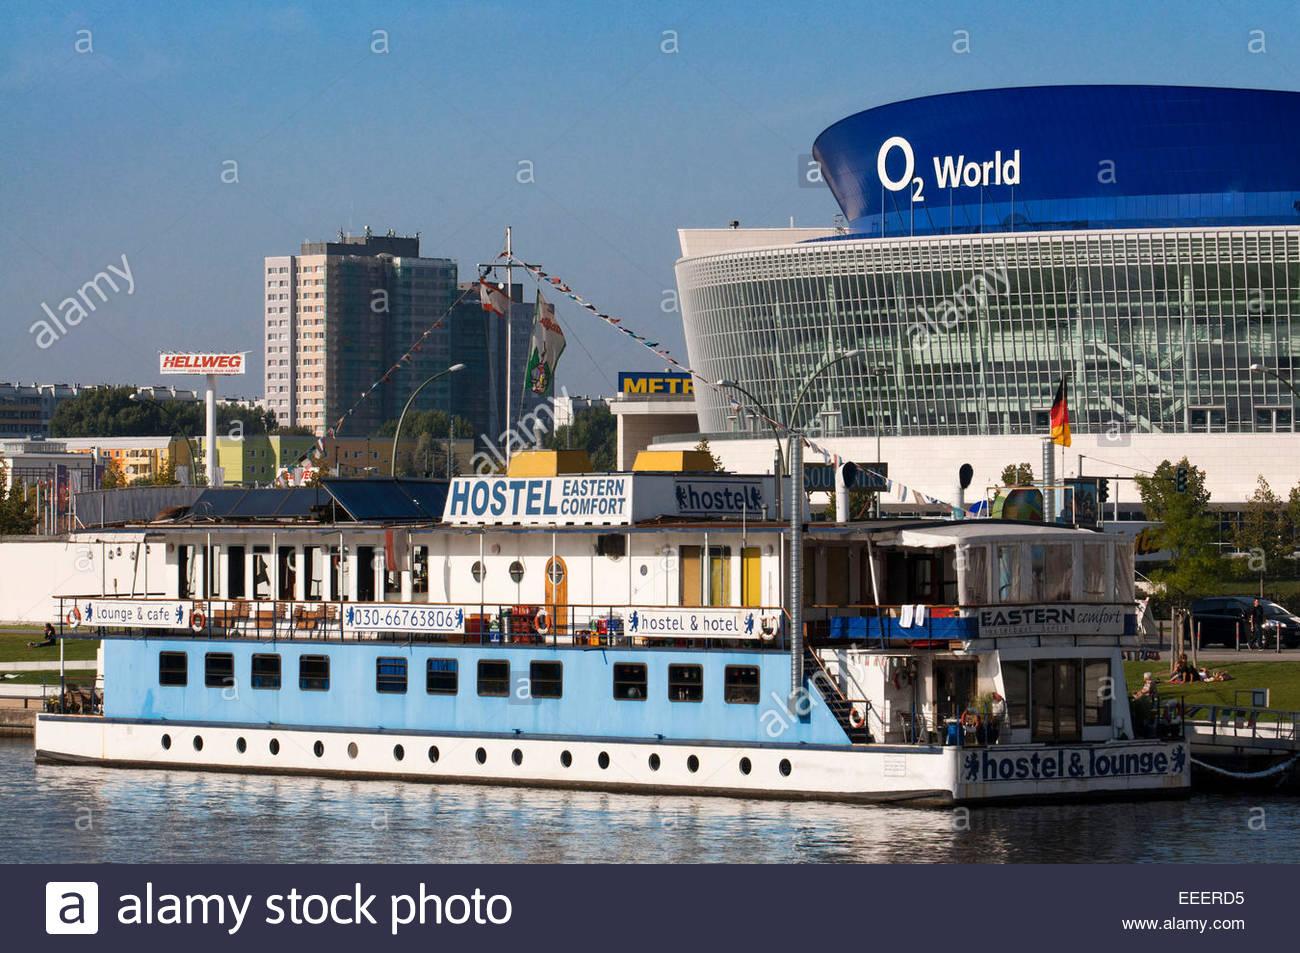 Berlin O2 World Spree Hostel Eastern Comfort. The hostel boats 'Eastern Comfort & Western Comfort', - Stock Image